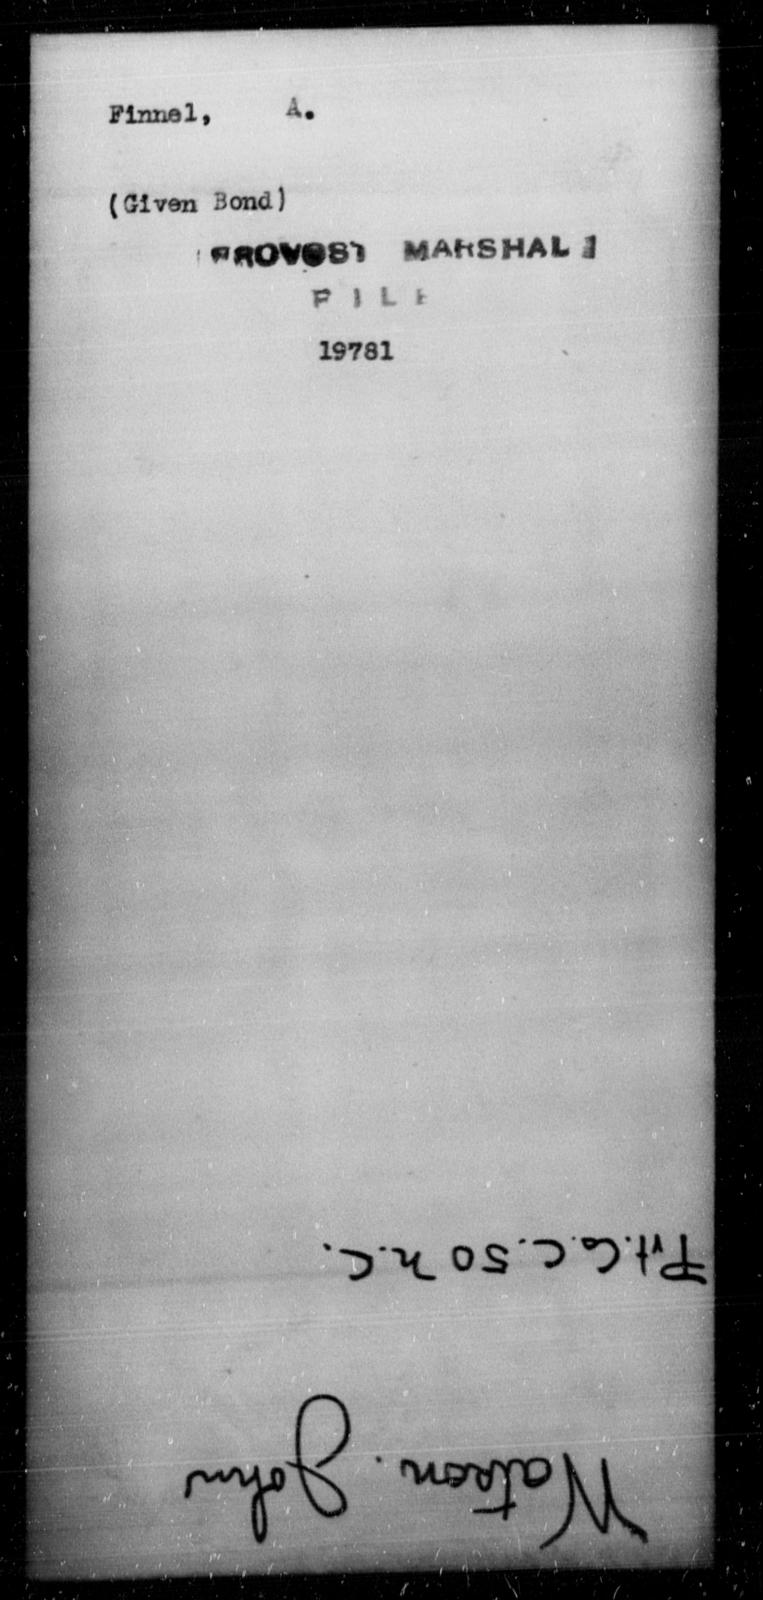 Finnel, A - State: [Blank] - Year: [Blank]